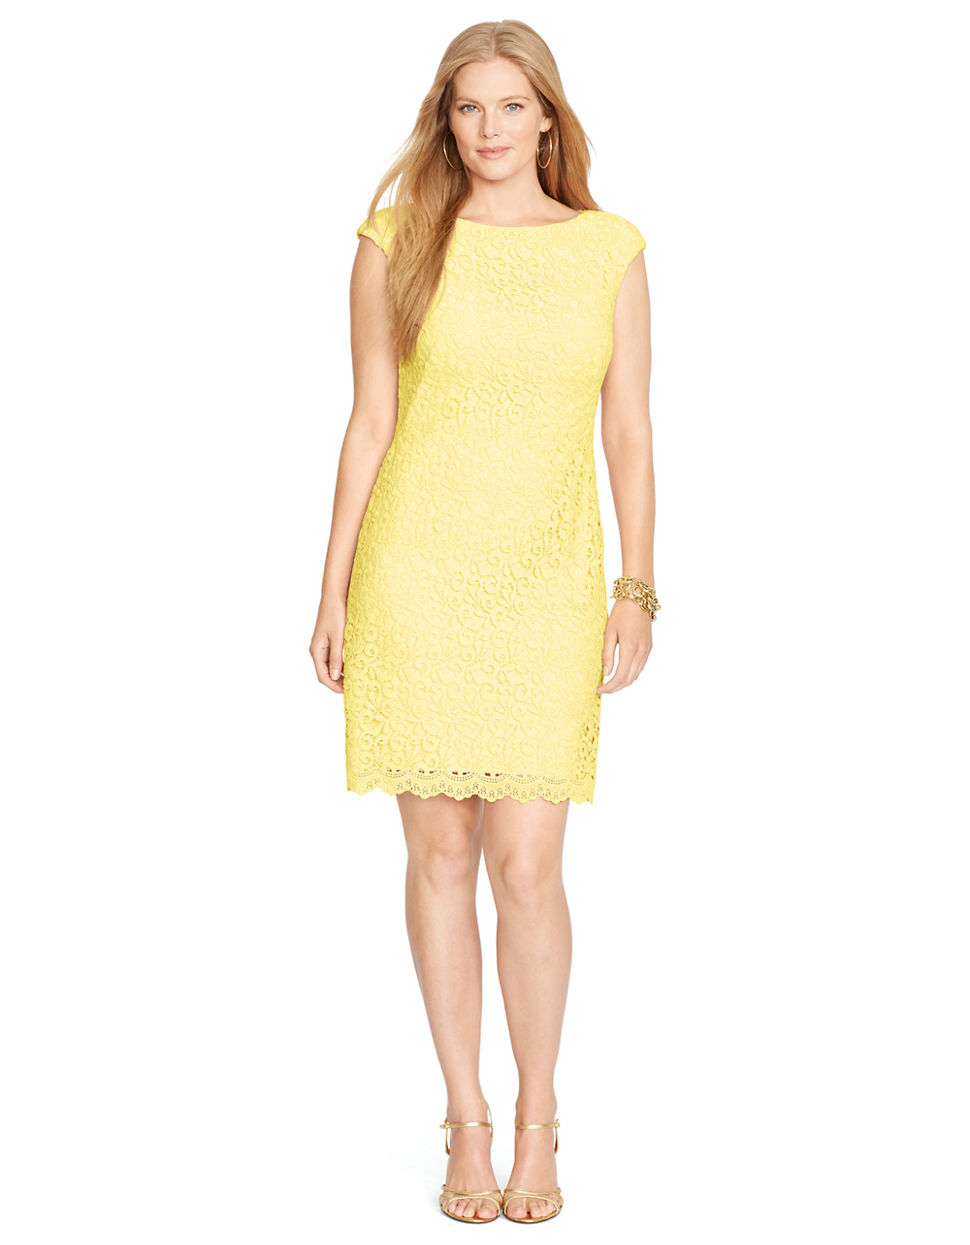 Galerry sheath dress yellow